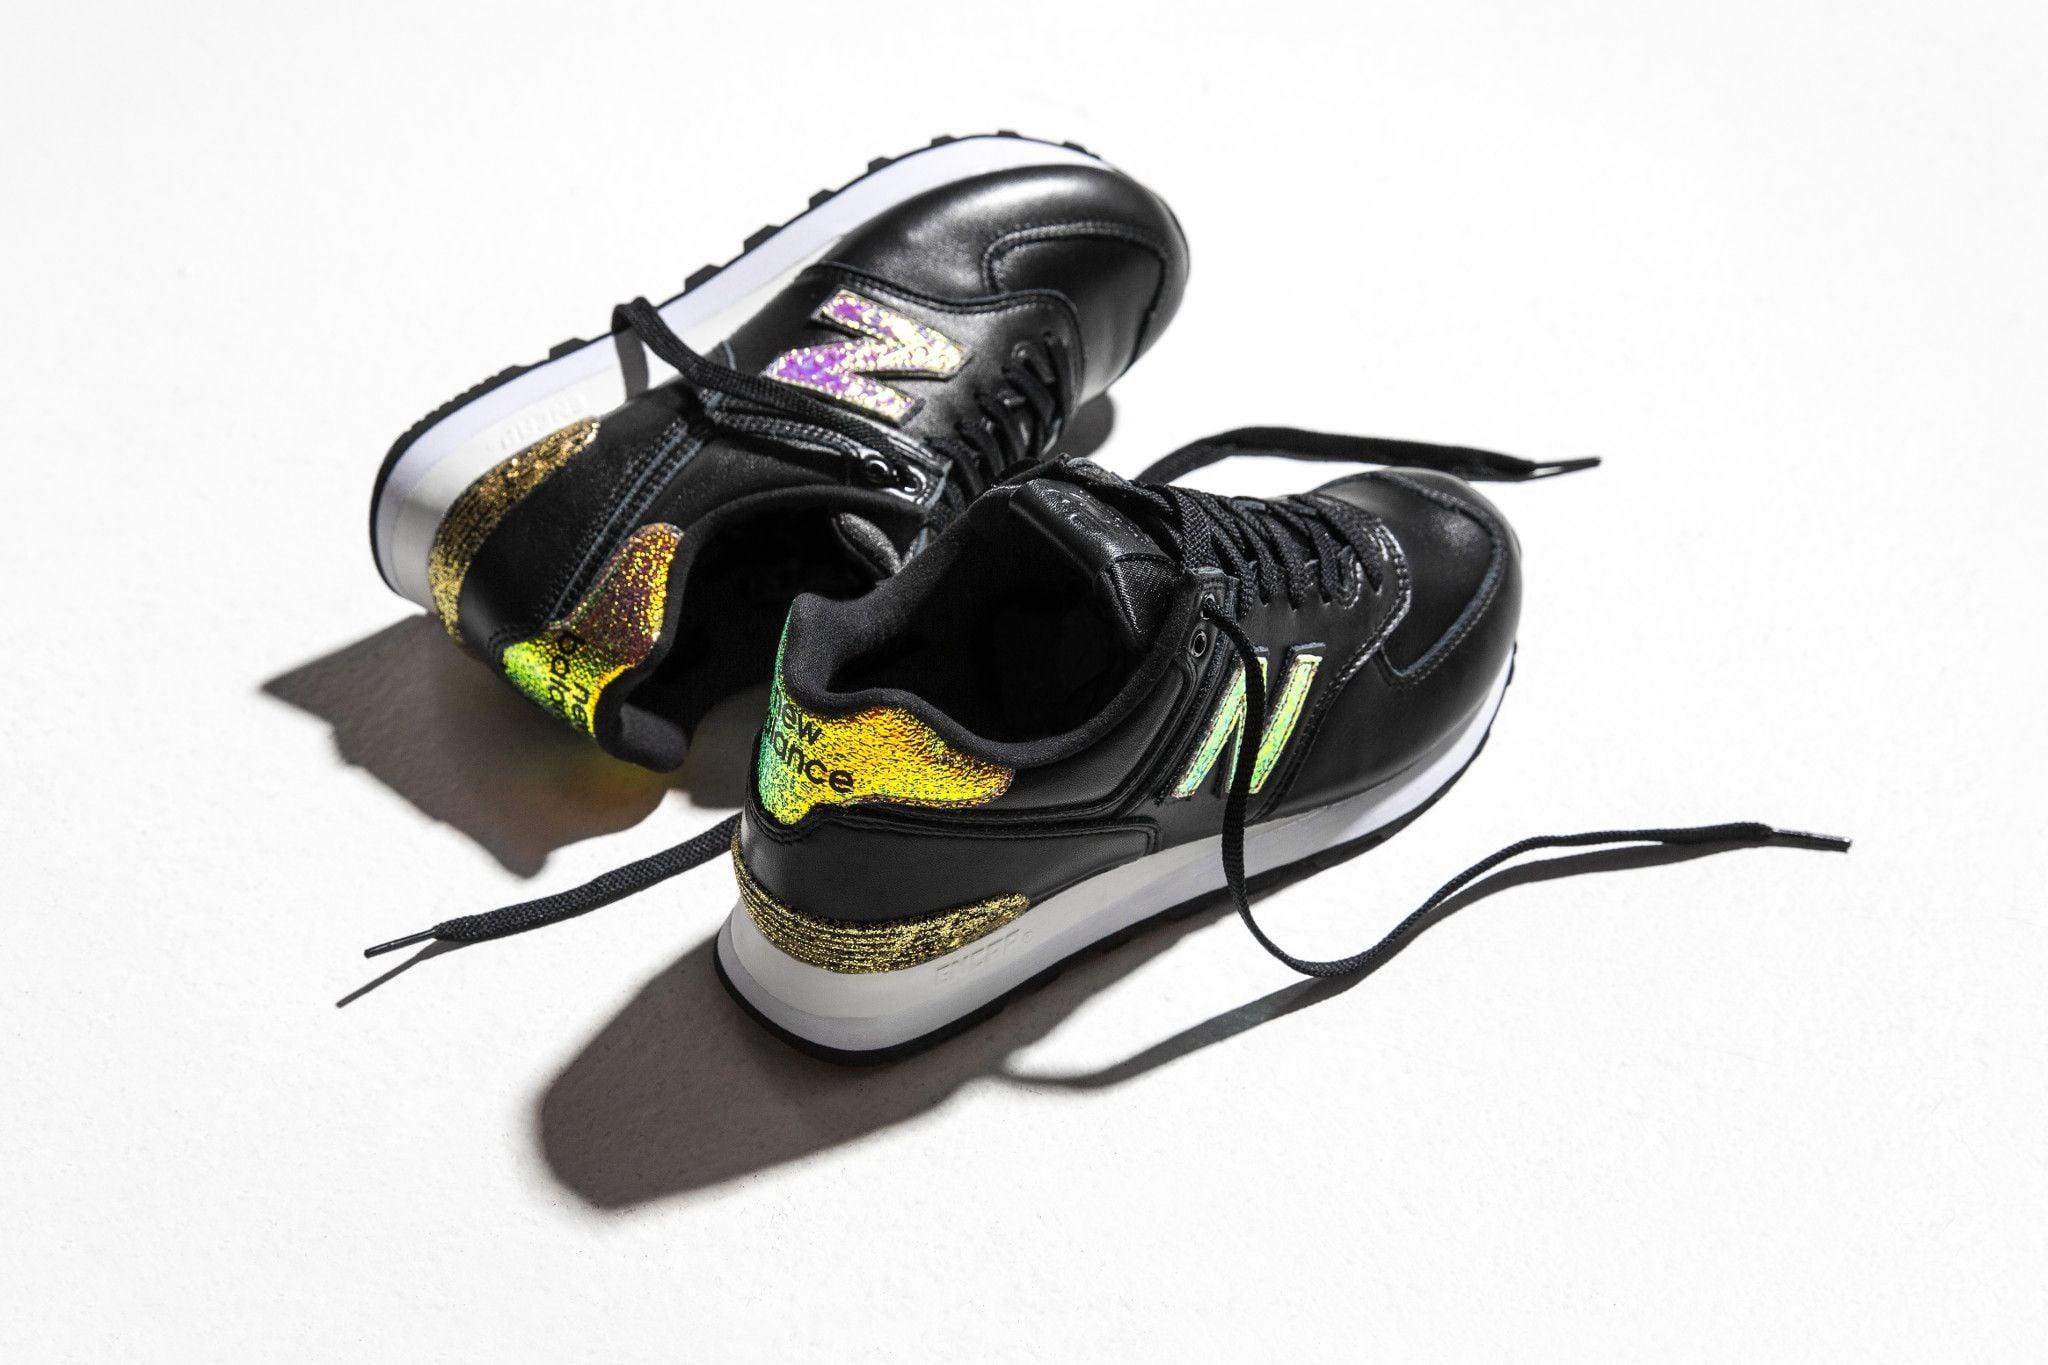 New Balance Metallic Glitter Sneakers   POPSUGAR Fashion